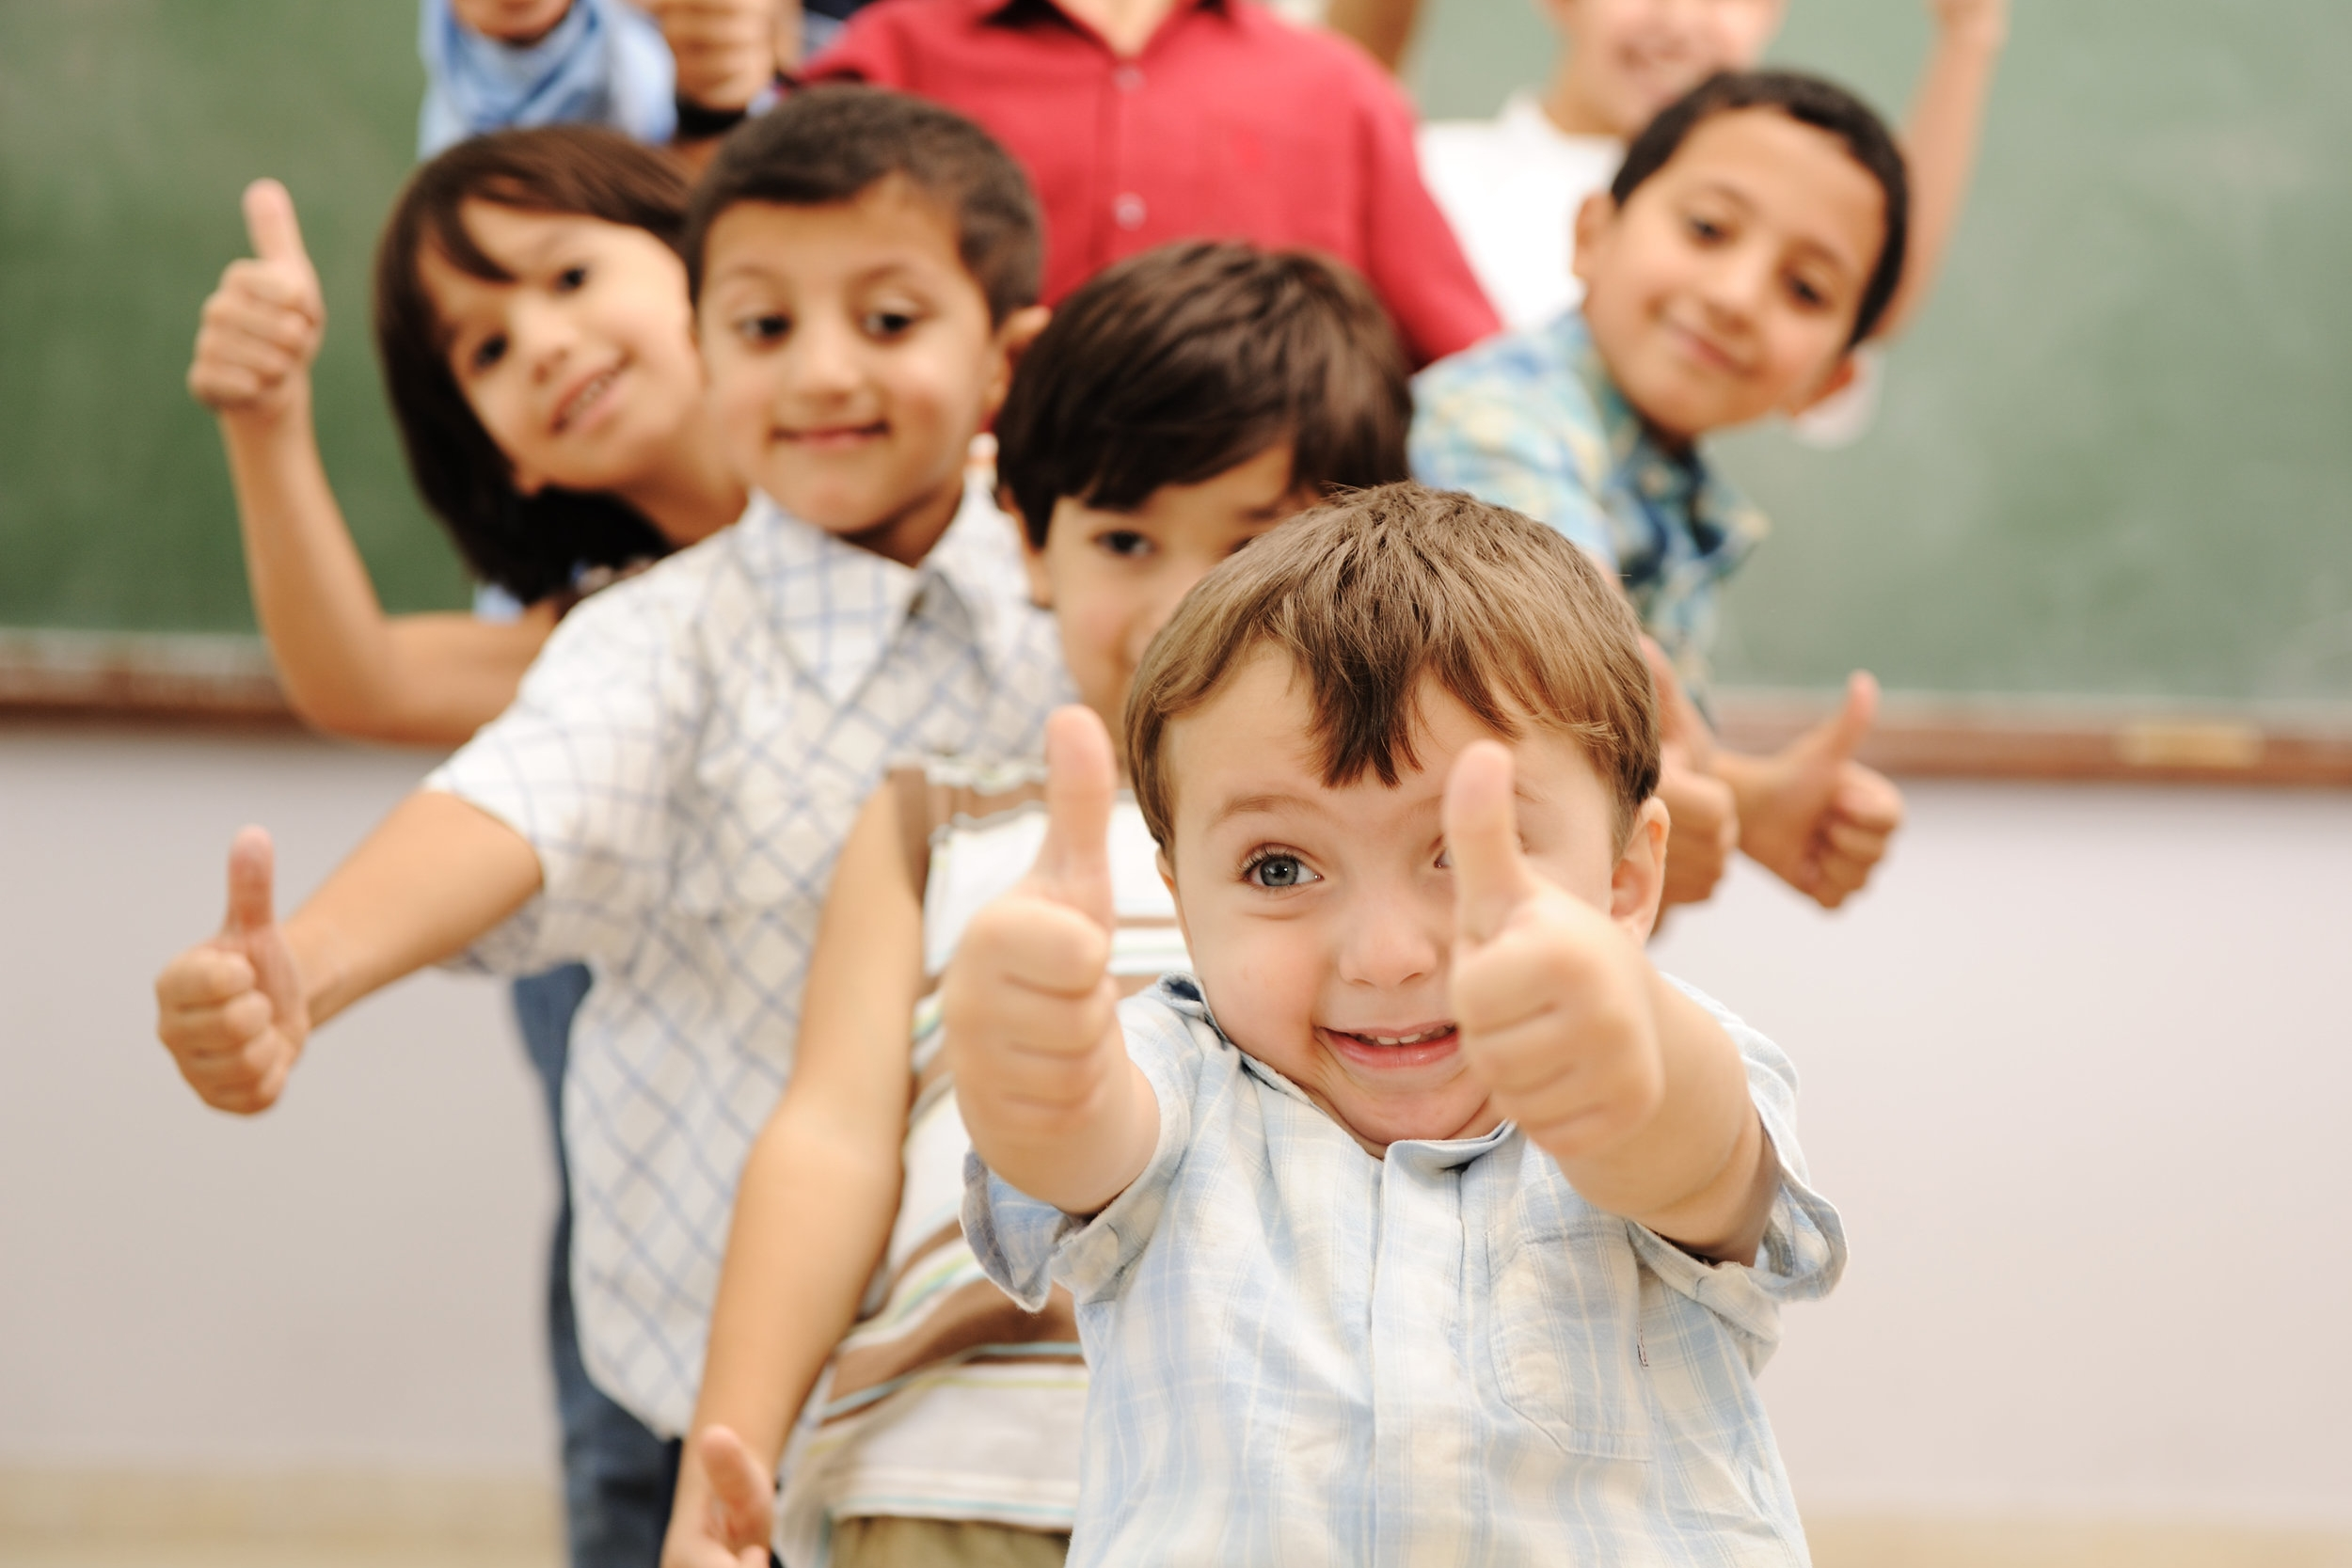 bigstock-Children-at-school-classroom-32461277.jpg